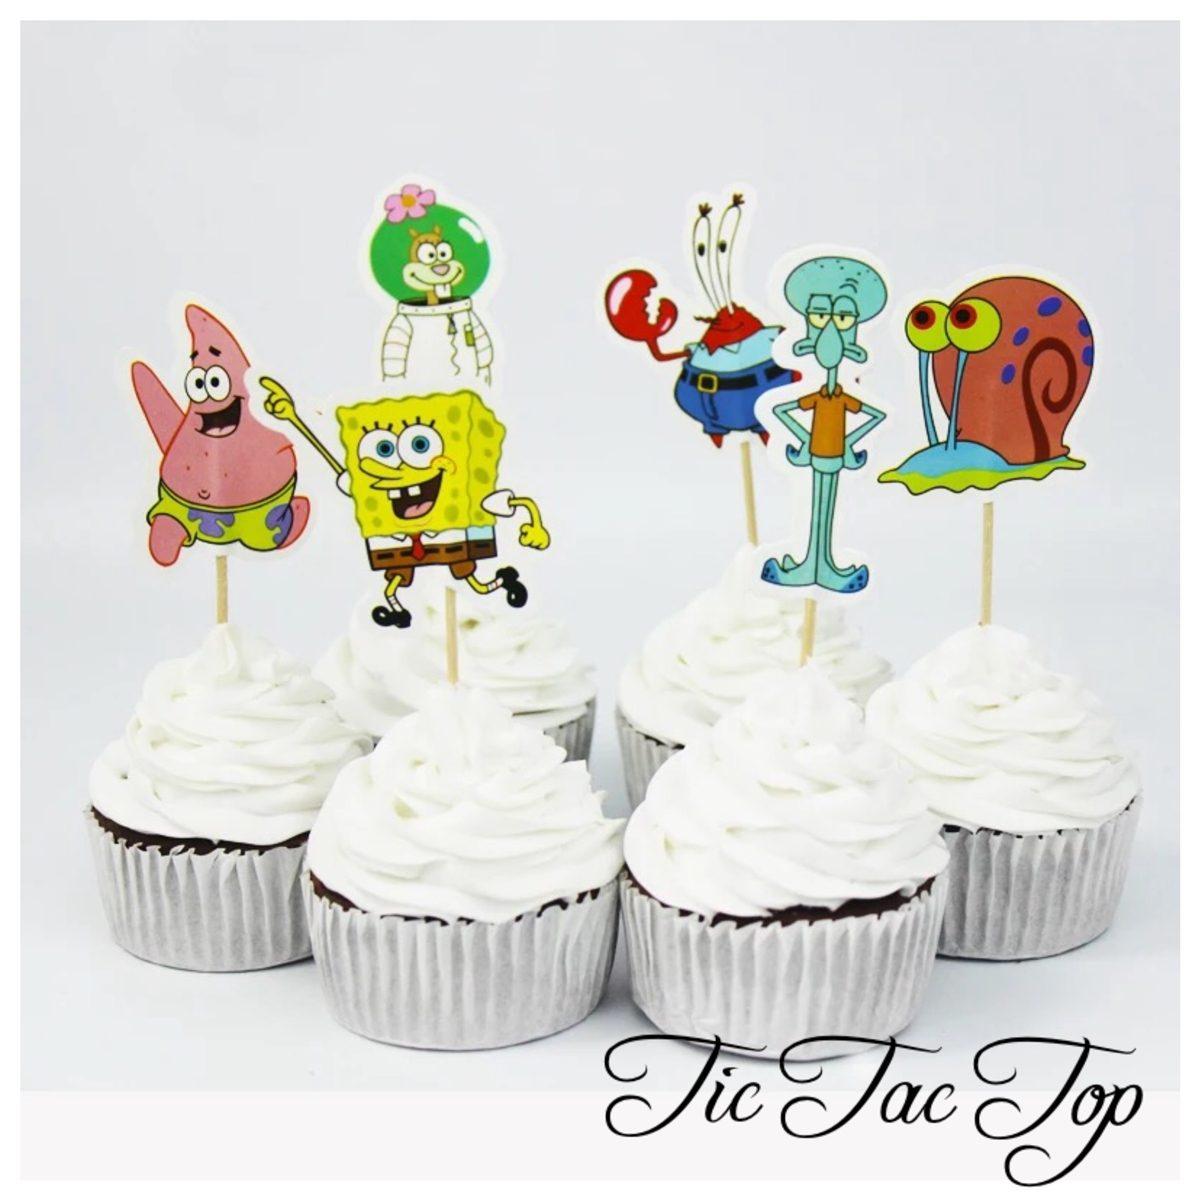 Spongebob SquarePants & Friends Topper Picks - 12/set